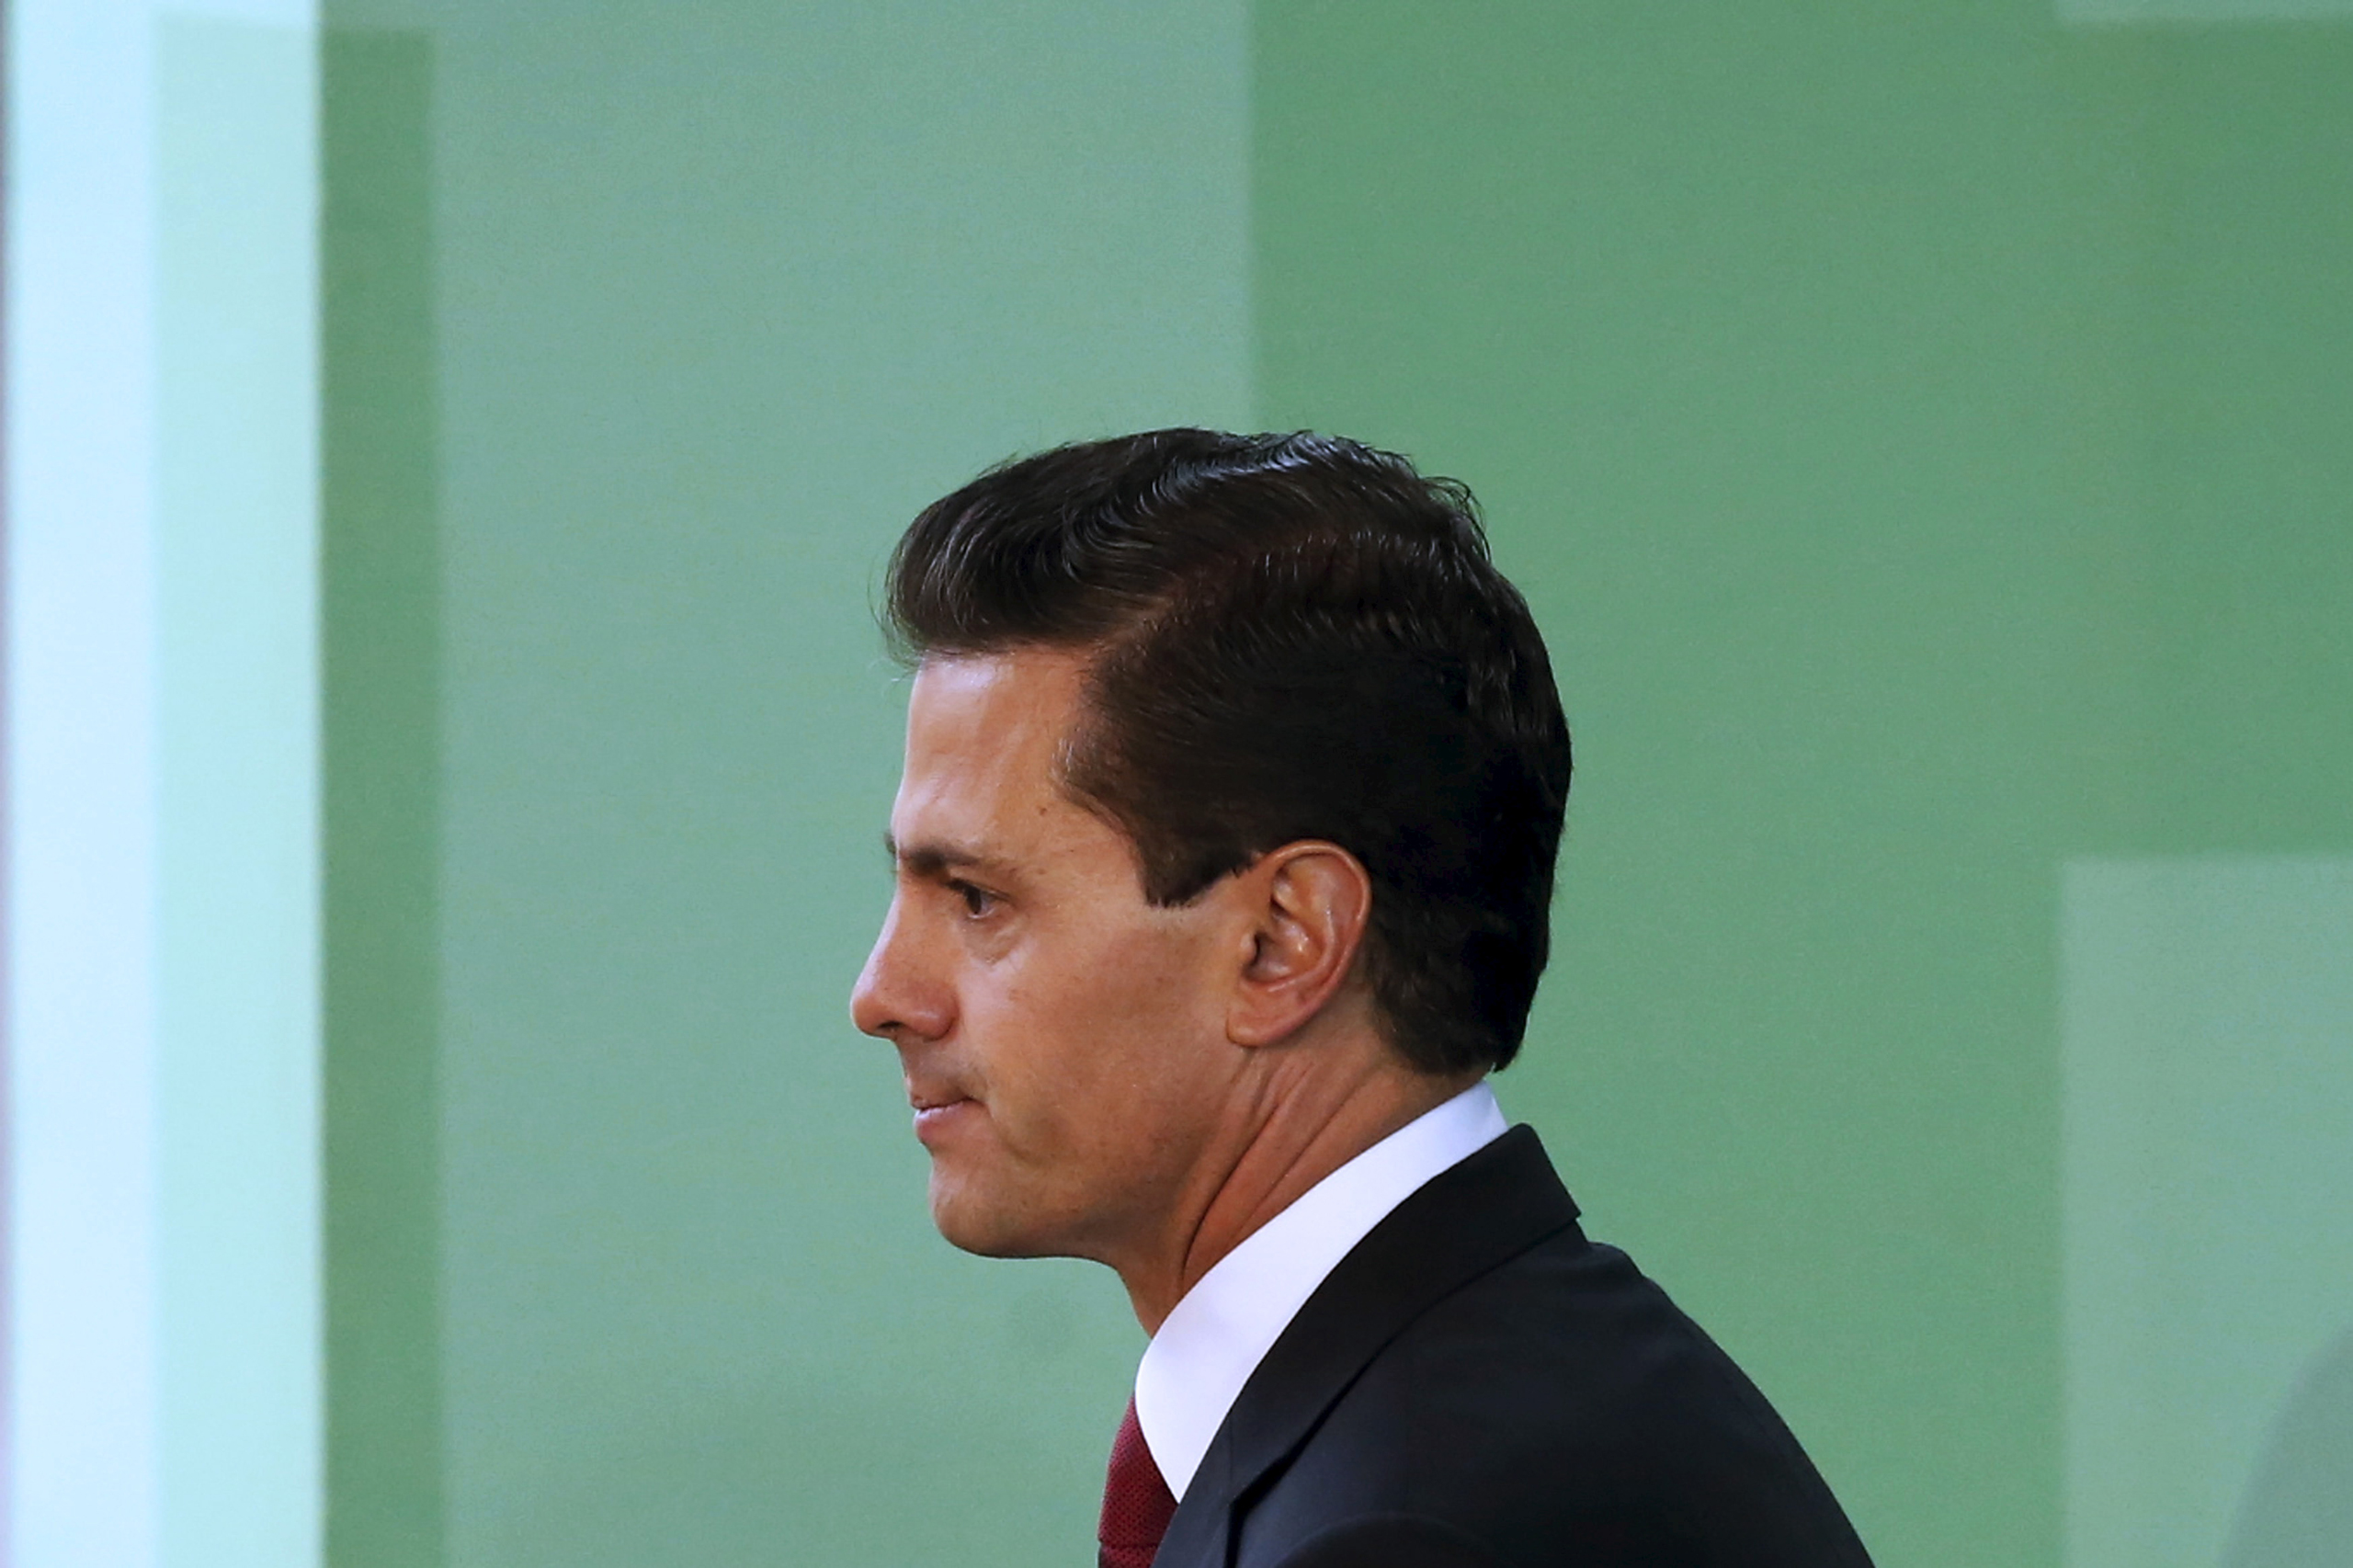 Mexico's President Enrique Pena Nieto seen during an announcement in Mexico City on April 21, 2016.